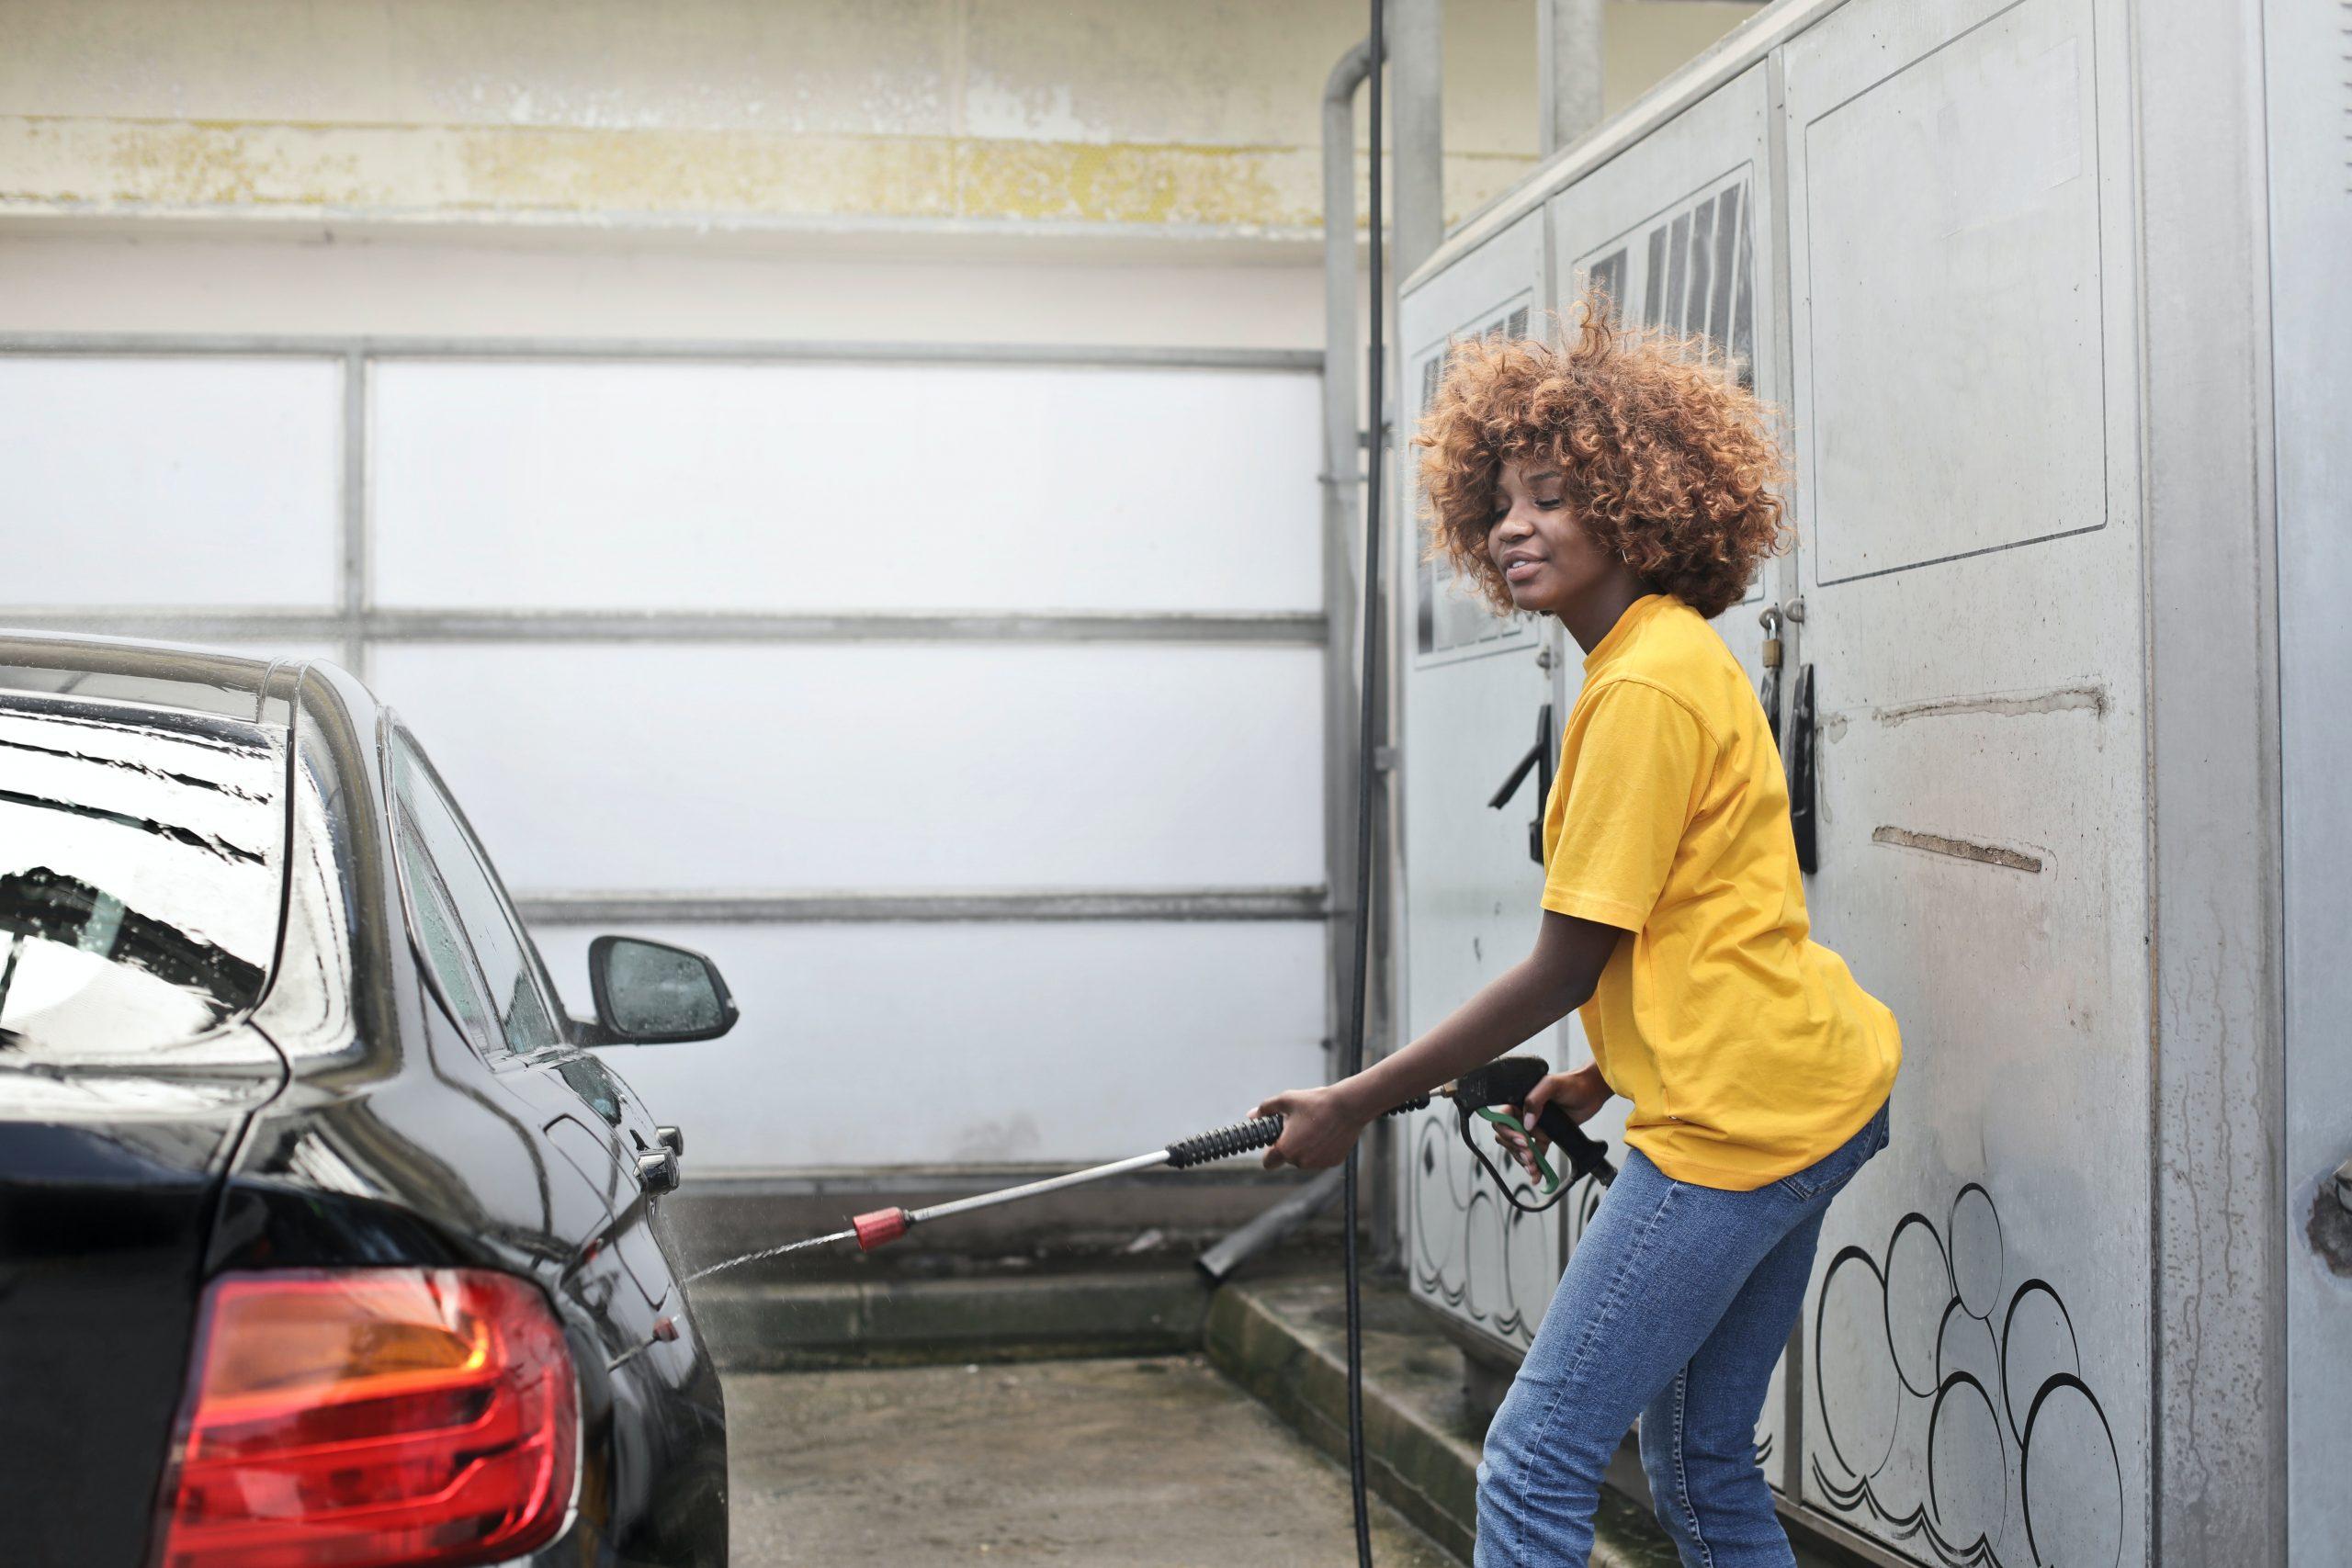 Mujer lavando su automóvil